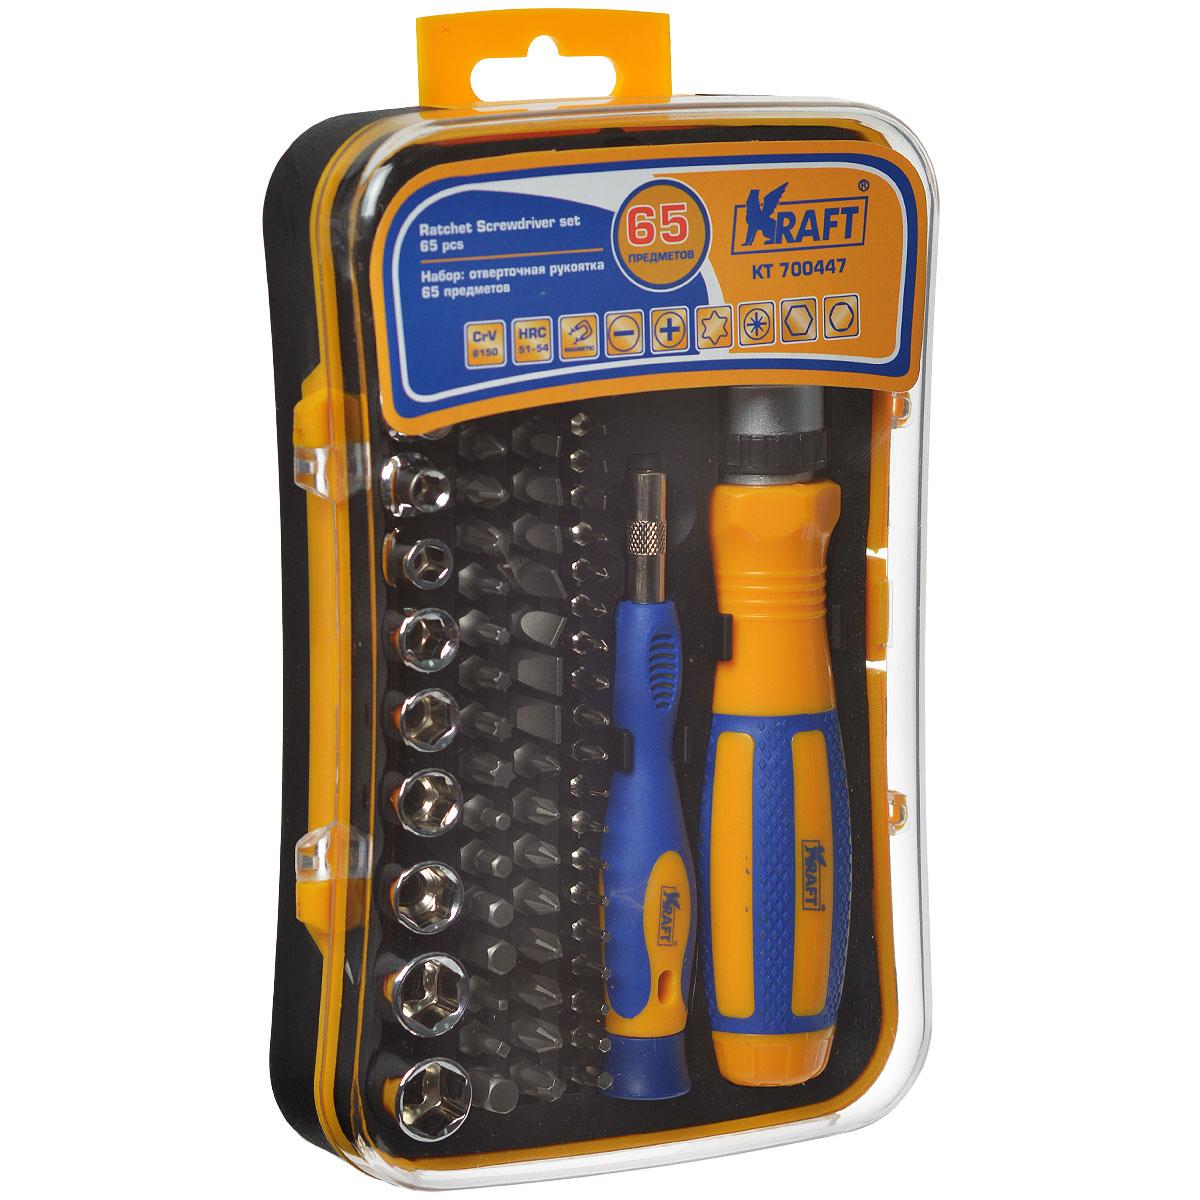 "Набор инструментов Kraft Professional"", 65 предметов КТ700447"